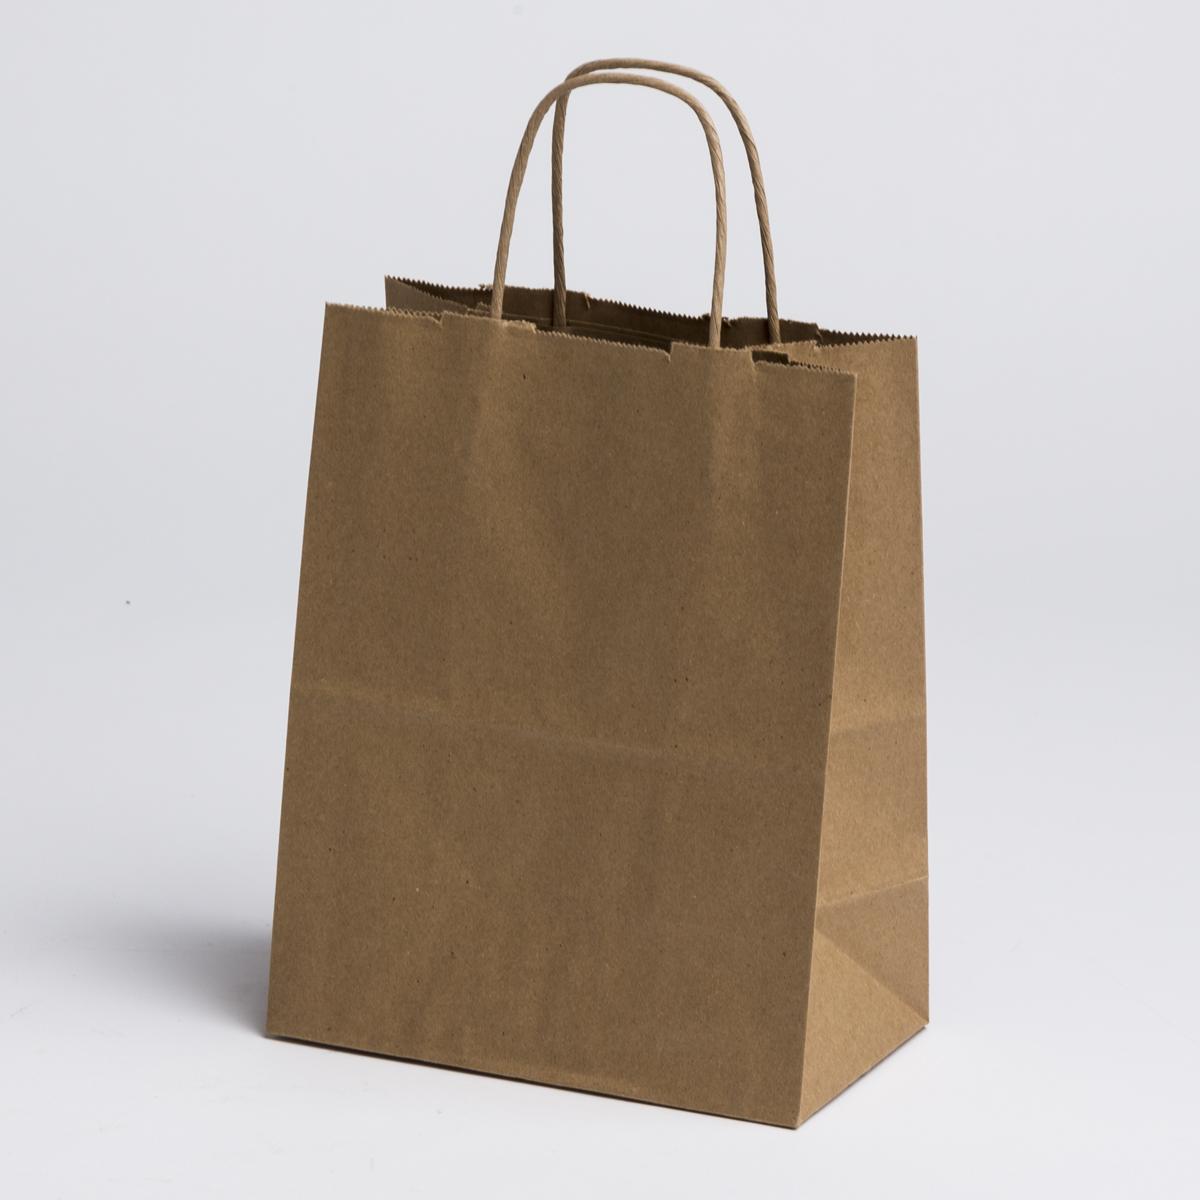 kraft paper shopping bags medium a b store fixtures. Black Bedroom Furniture Sets. Home Design Ideas